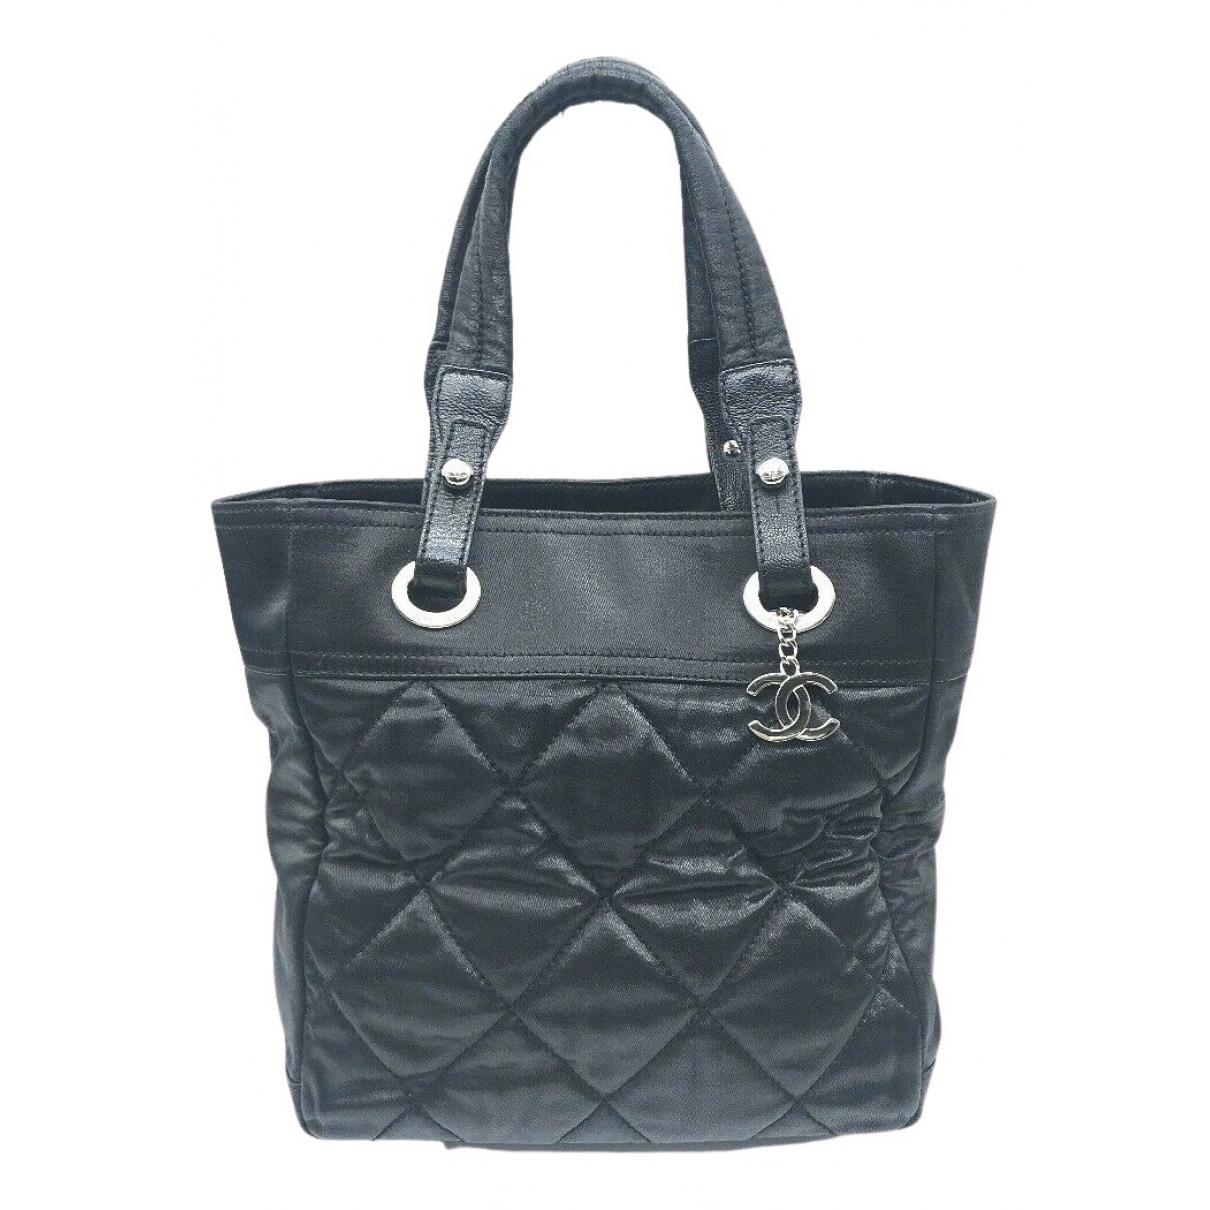 Chanel N Black Cloth handbag for Women N